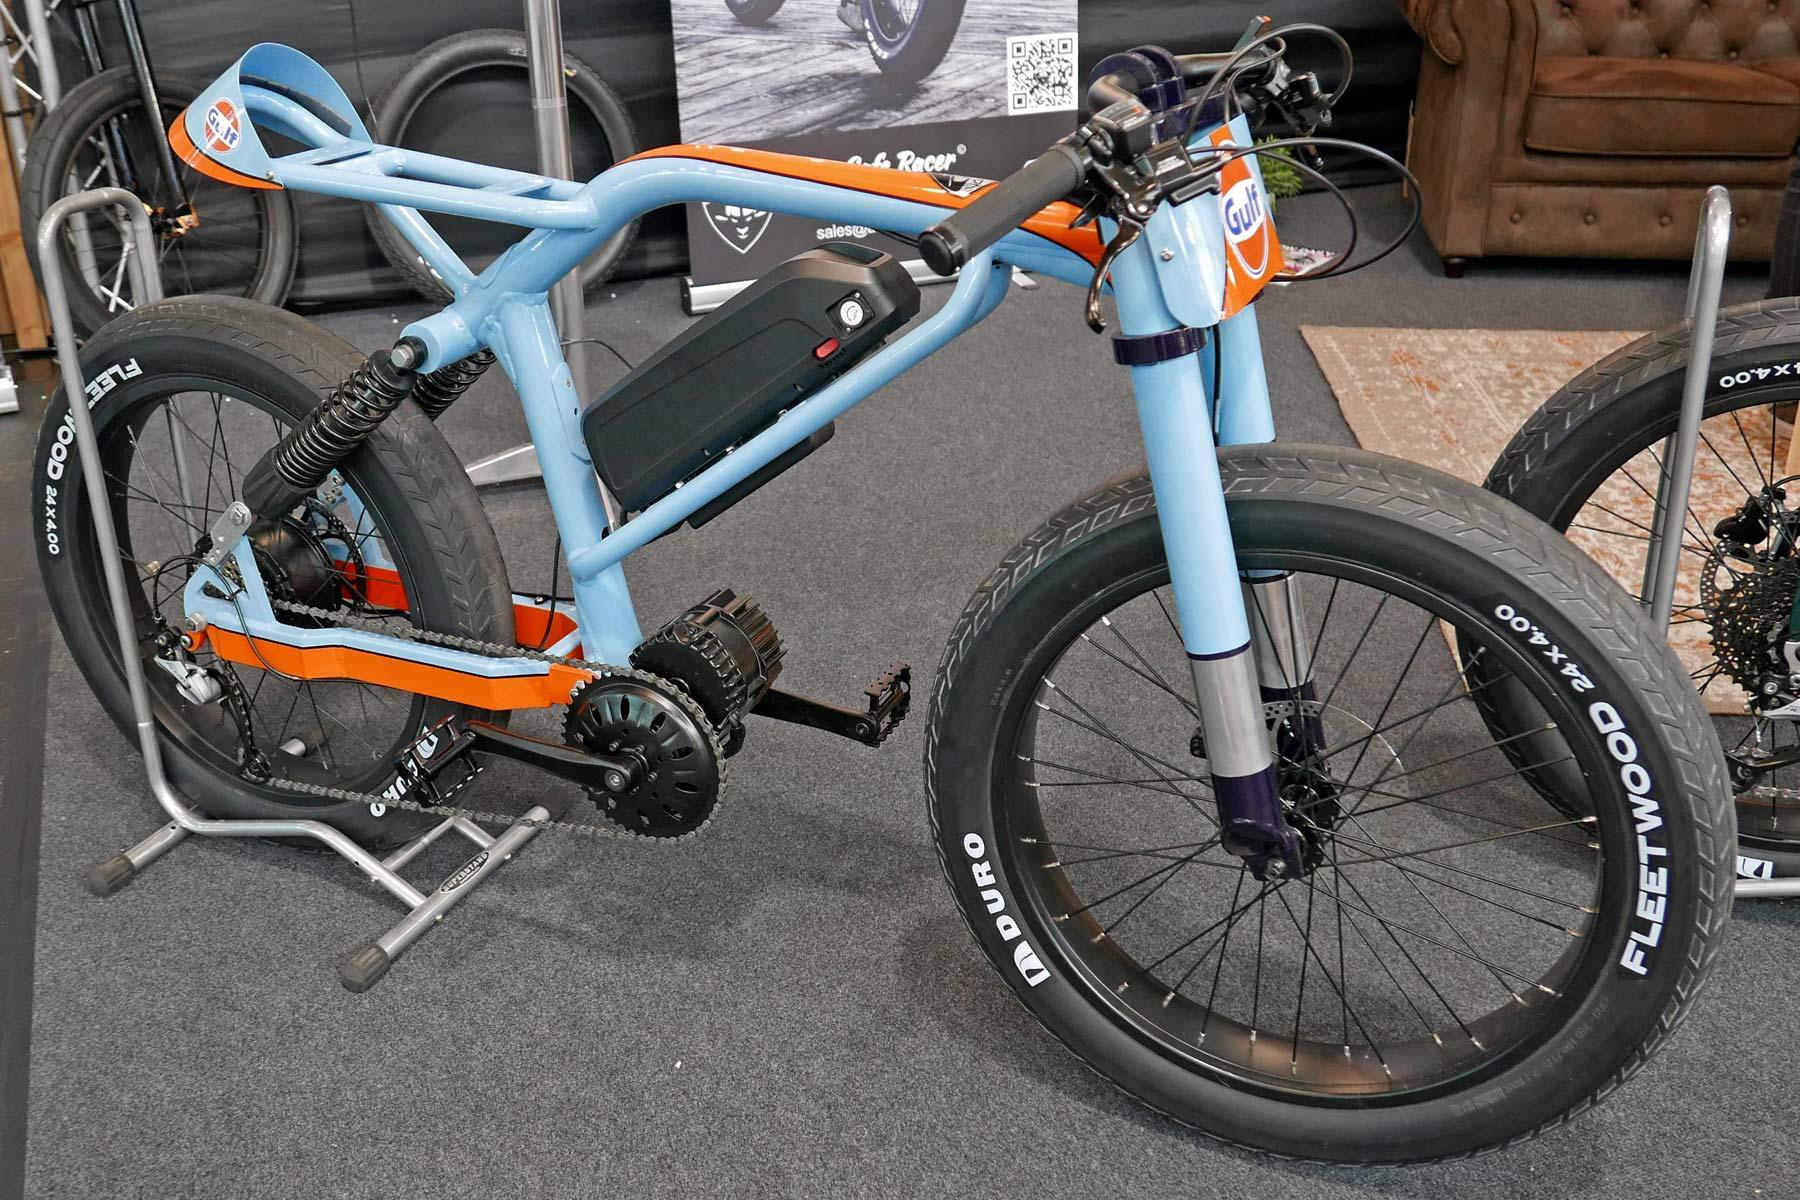 Aevon Le Cafe Racer custom e-bike cruiser project